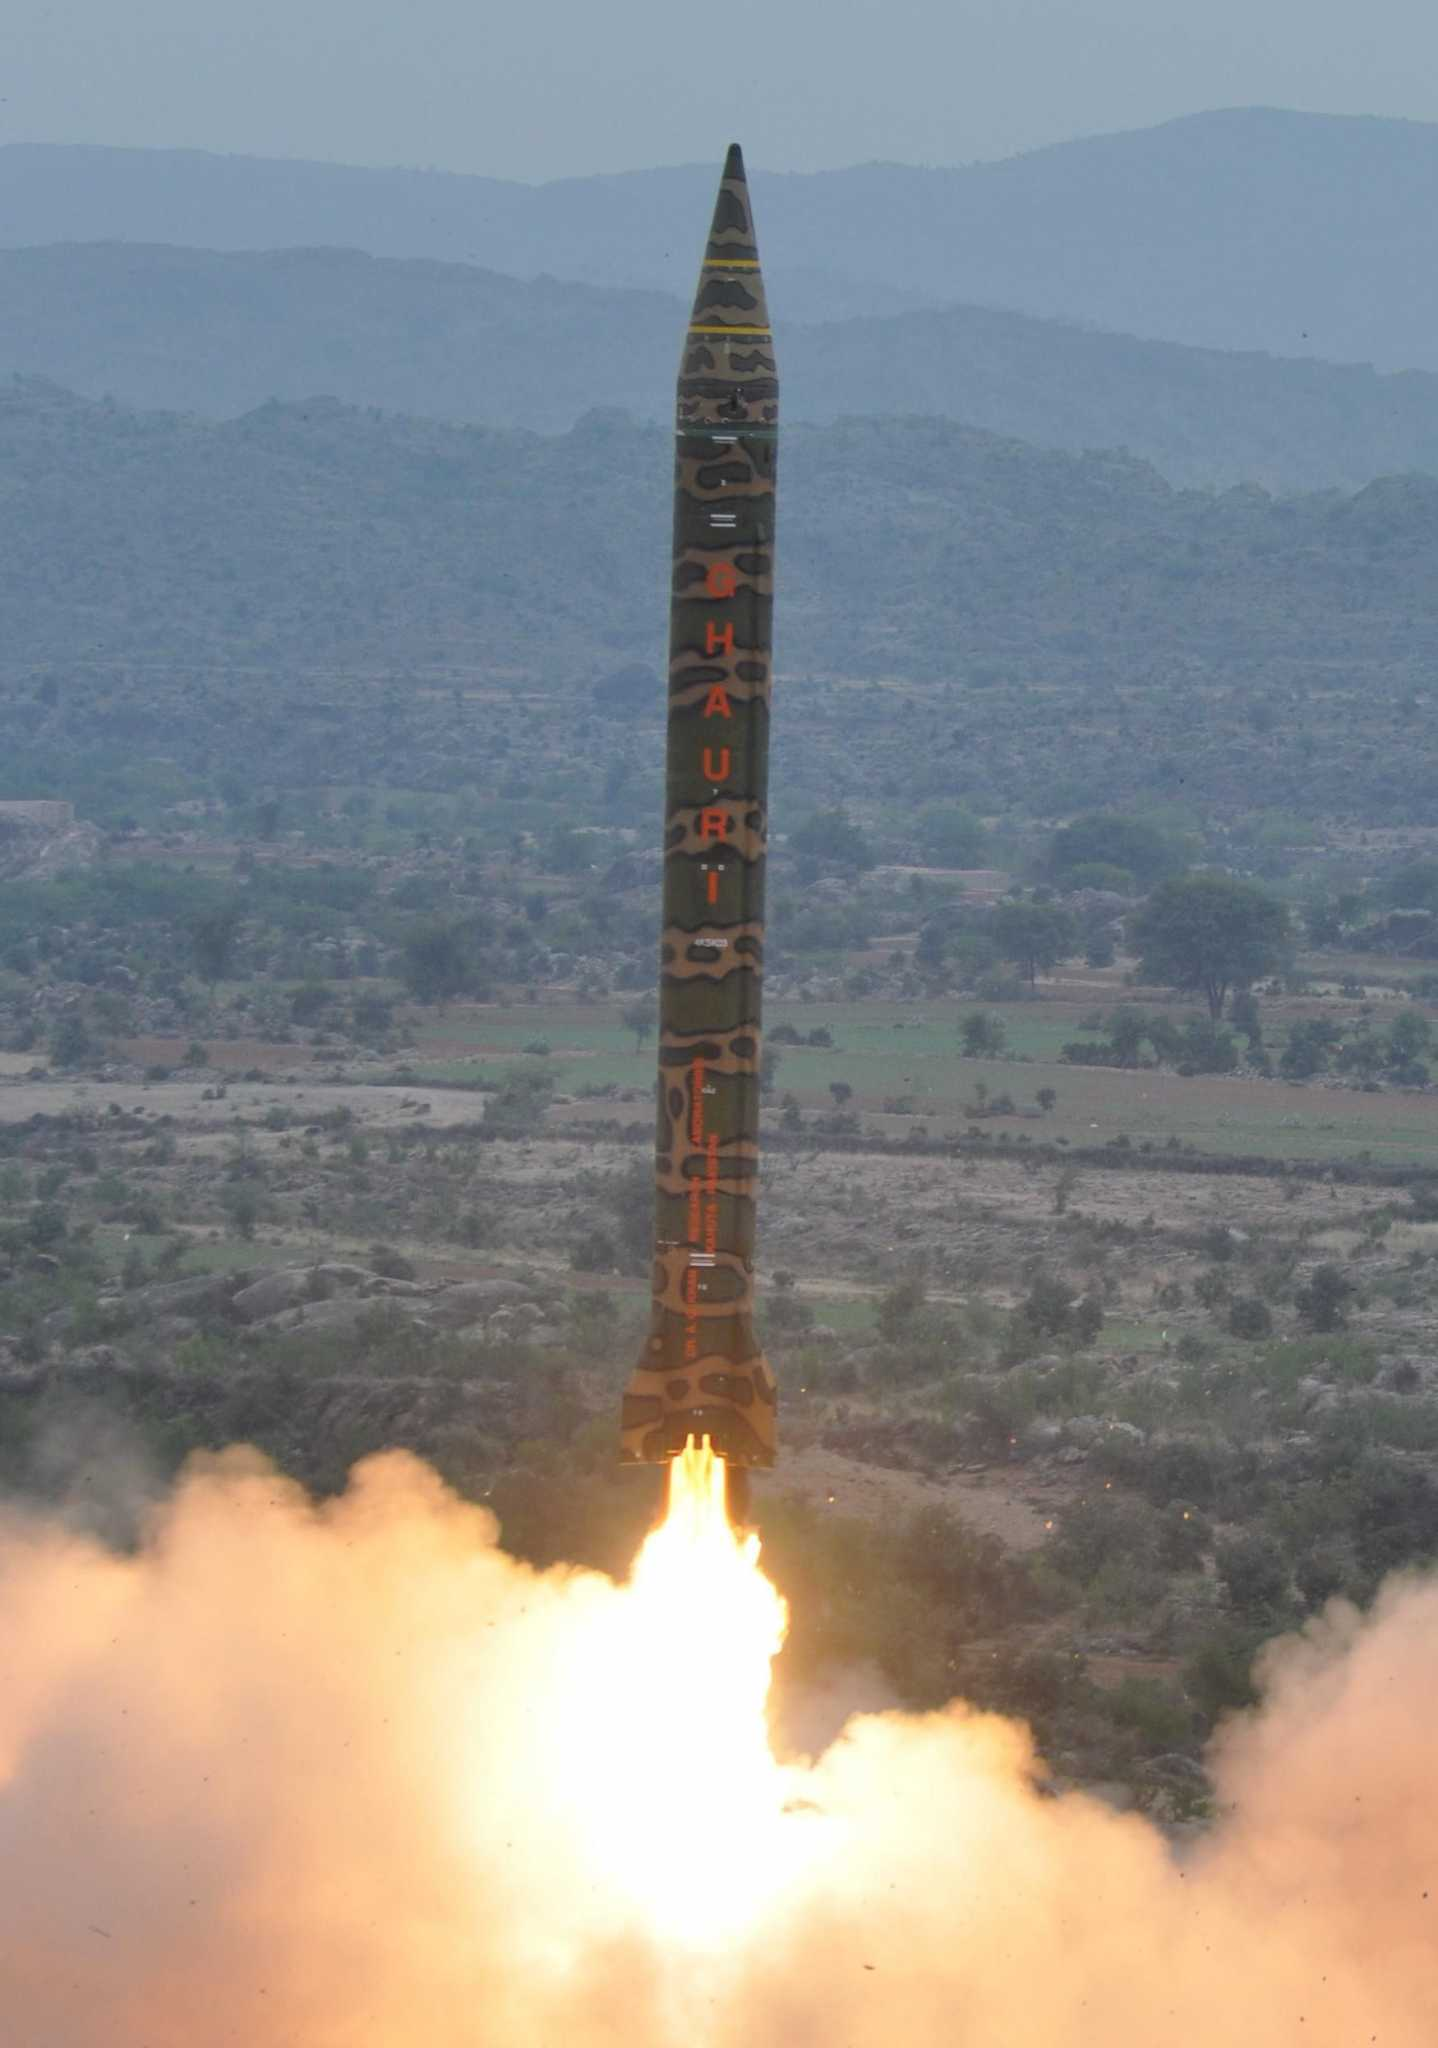 Pakistan Medium Range Ballistic Missile Hatf V (Ghauri)